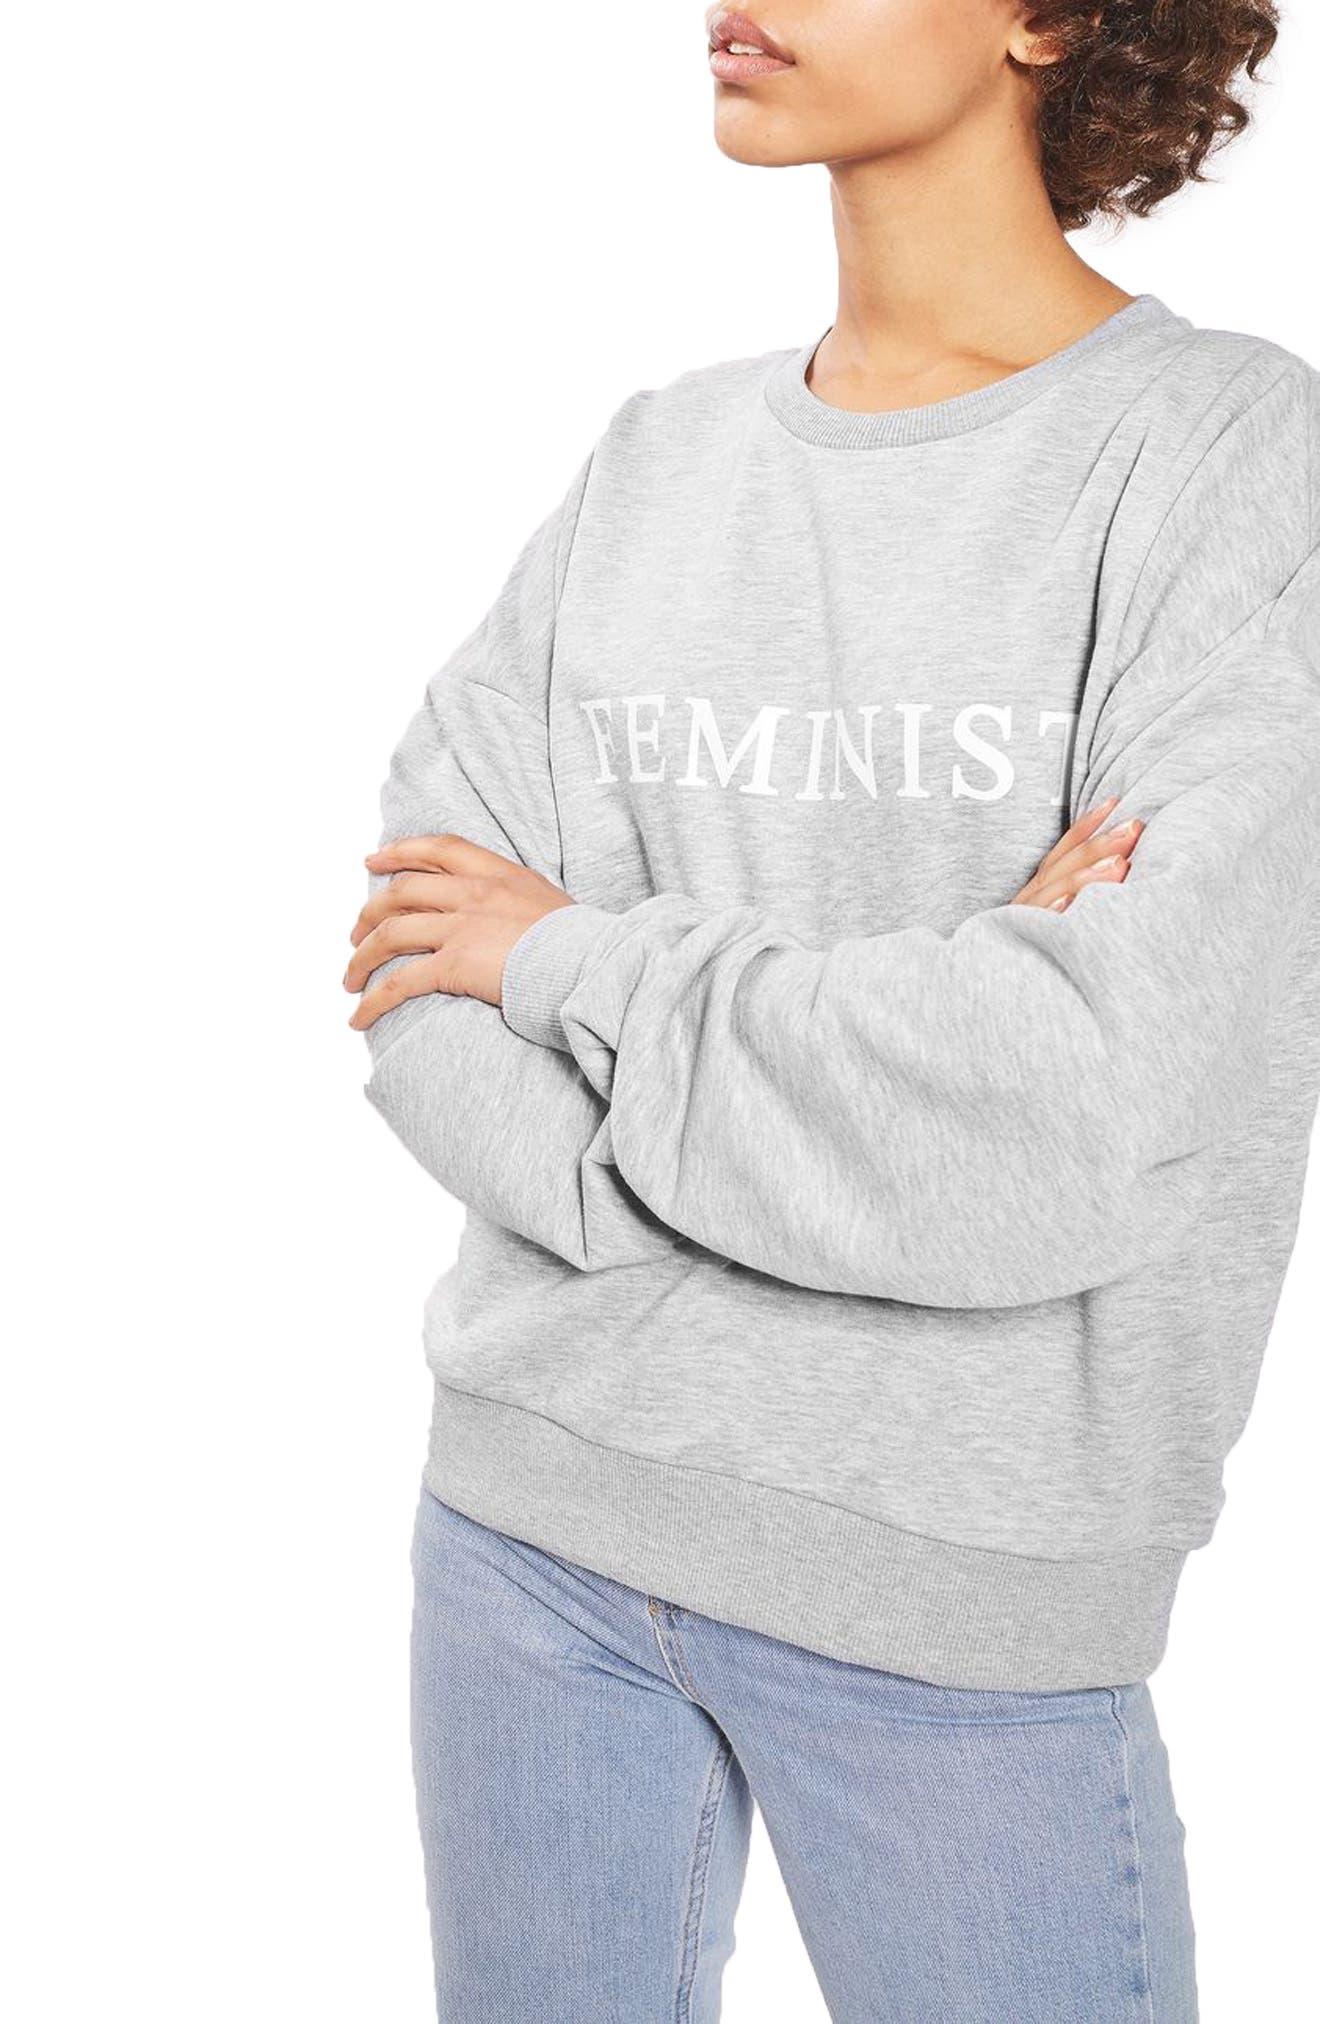 TOPSHOP Feminist Sweatshirt, Main, color, 020